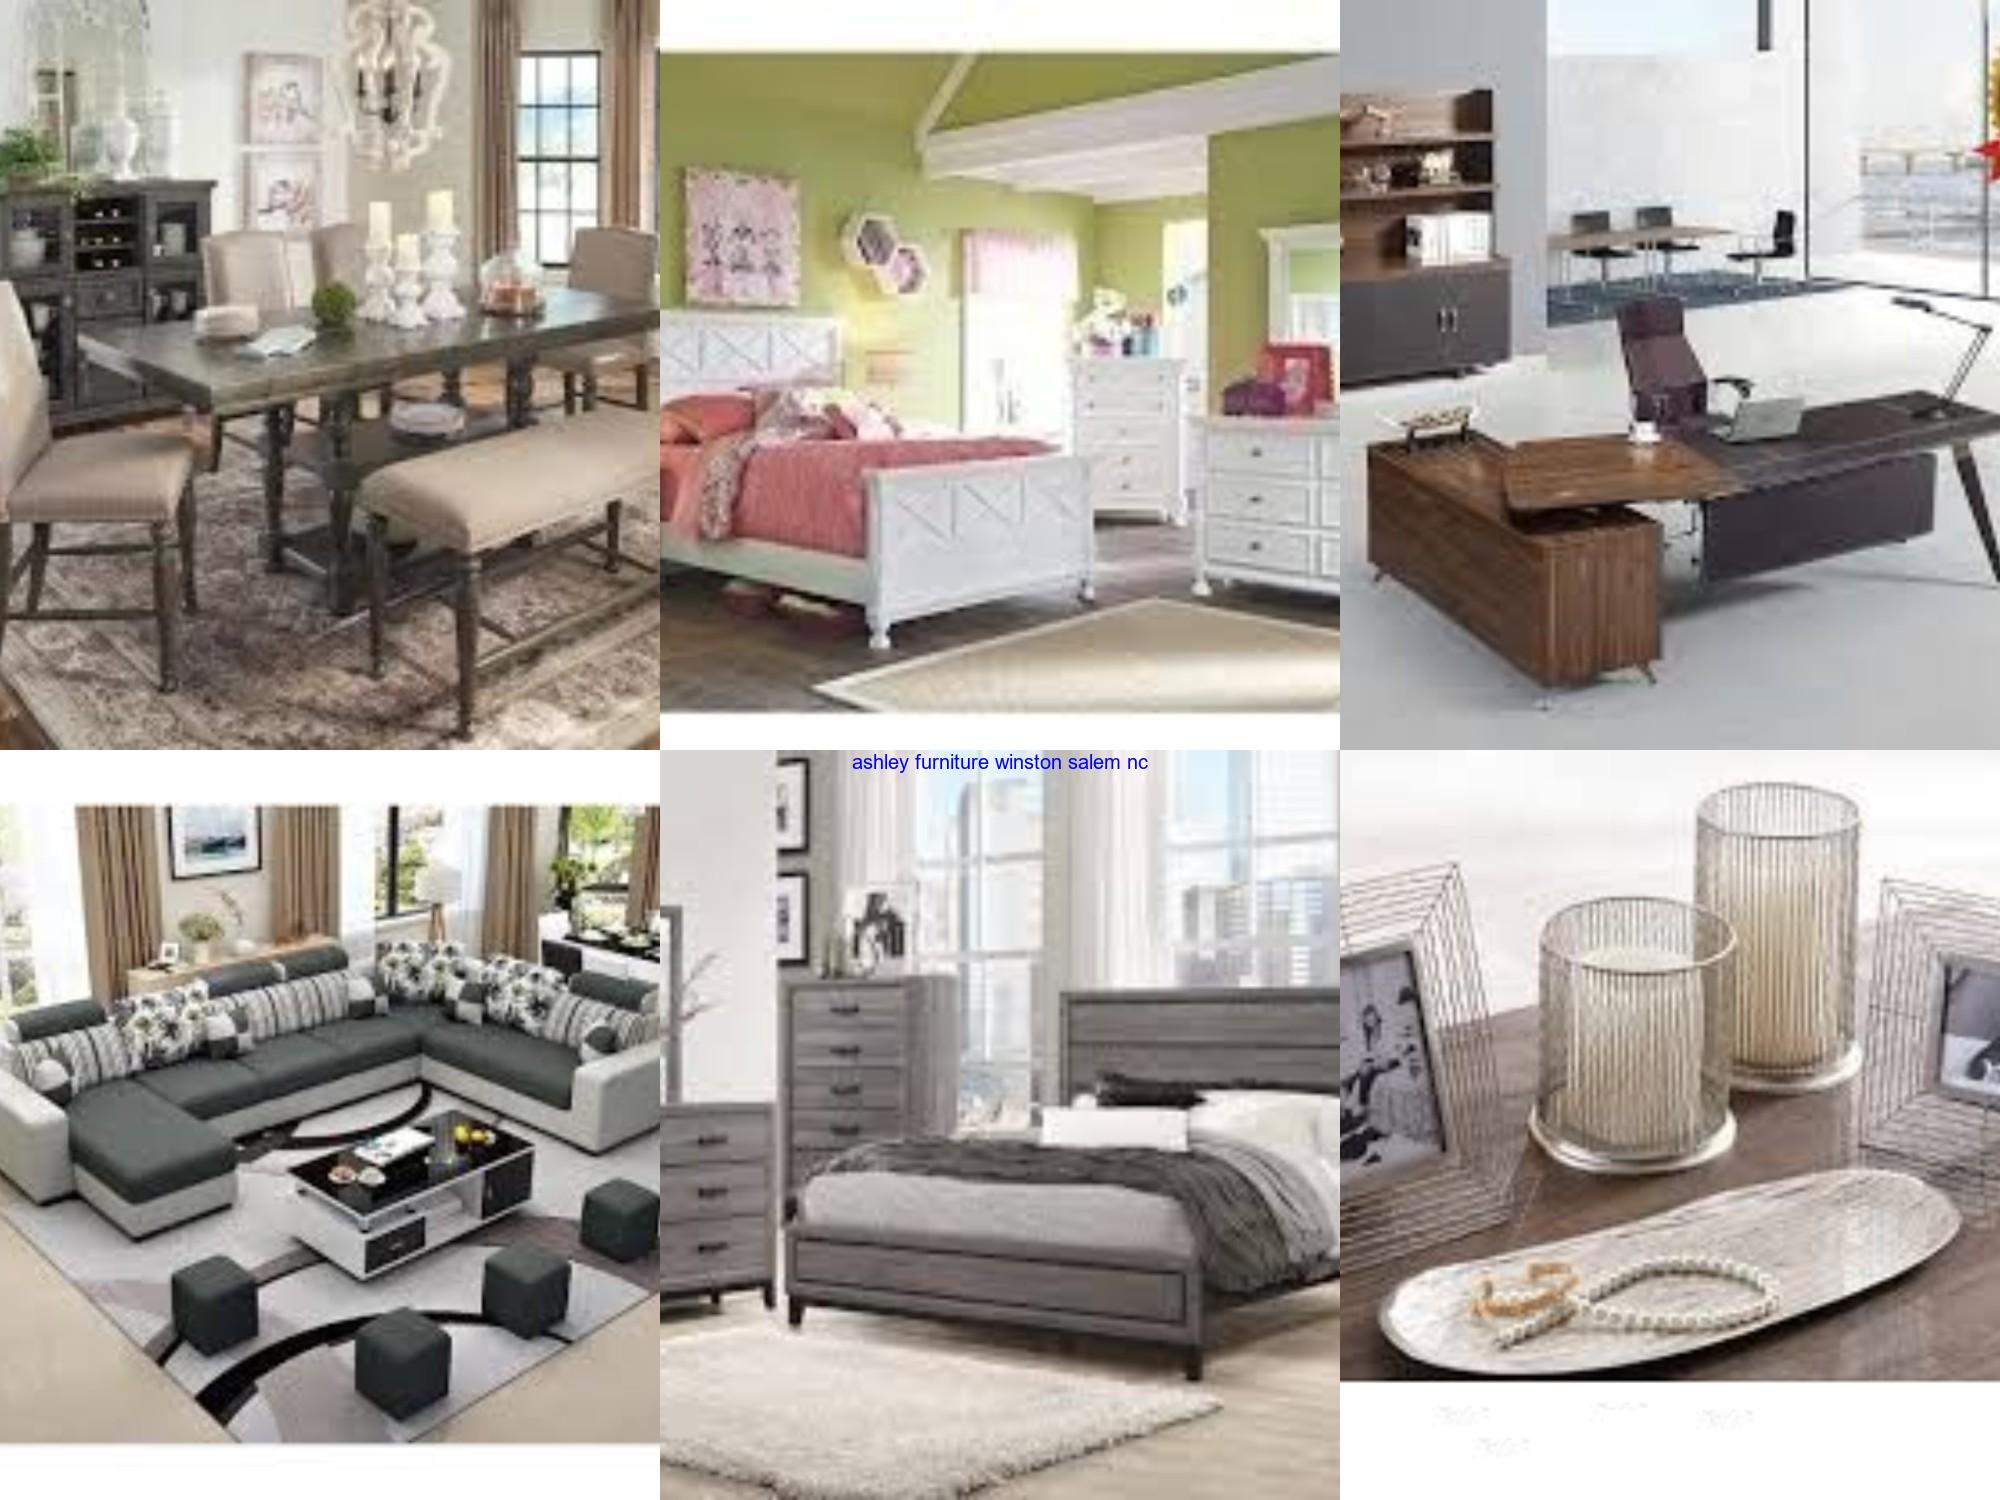 Ashley Furniture Winston Salem Nc In 2020 Furniture Prices